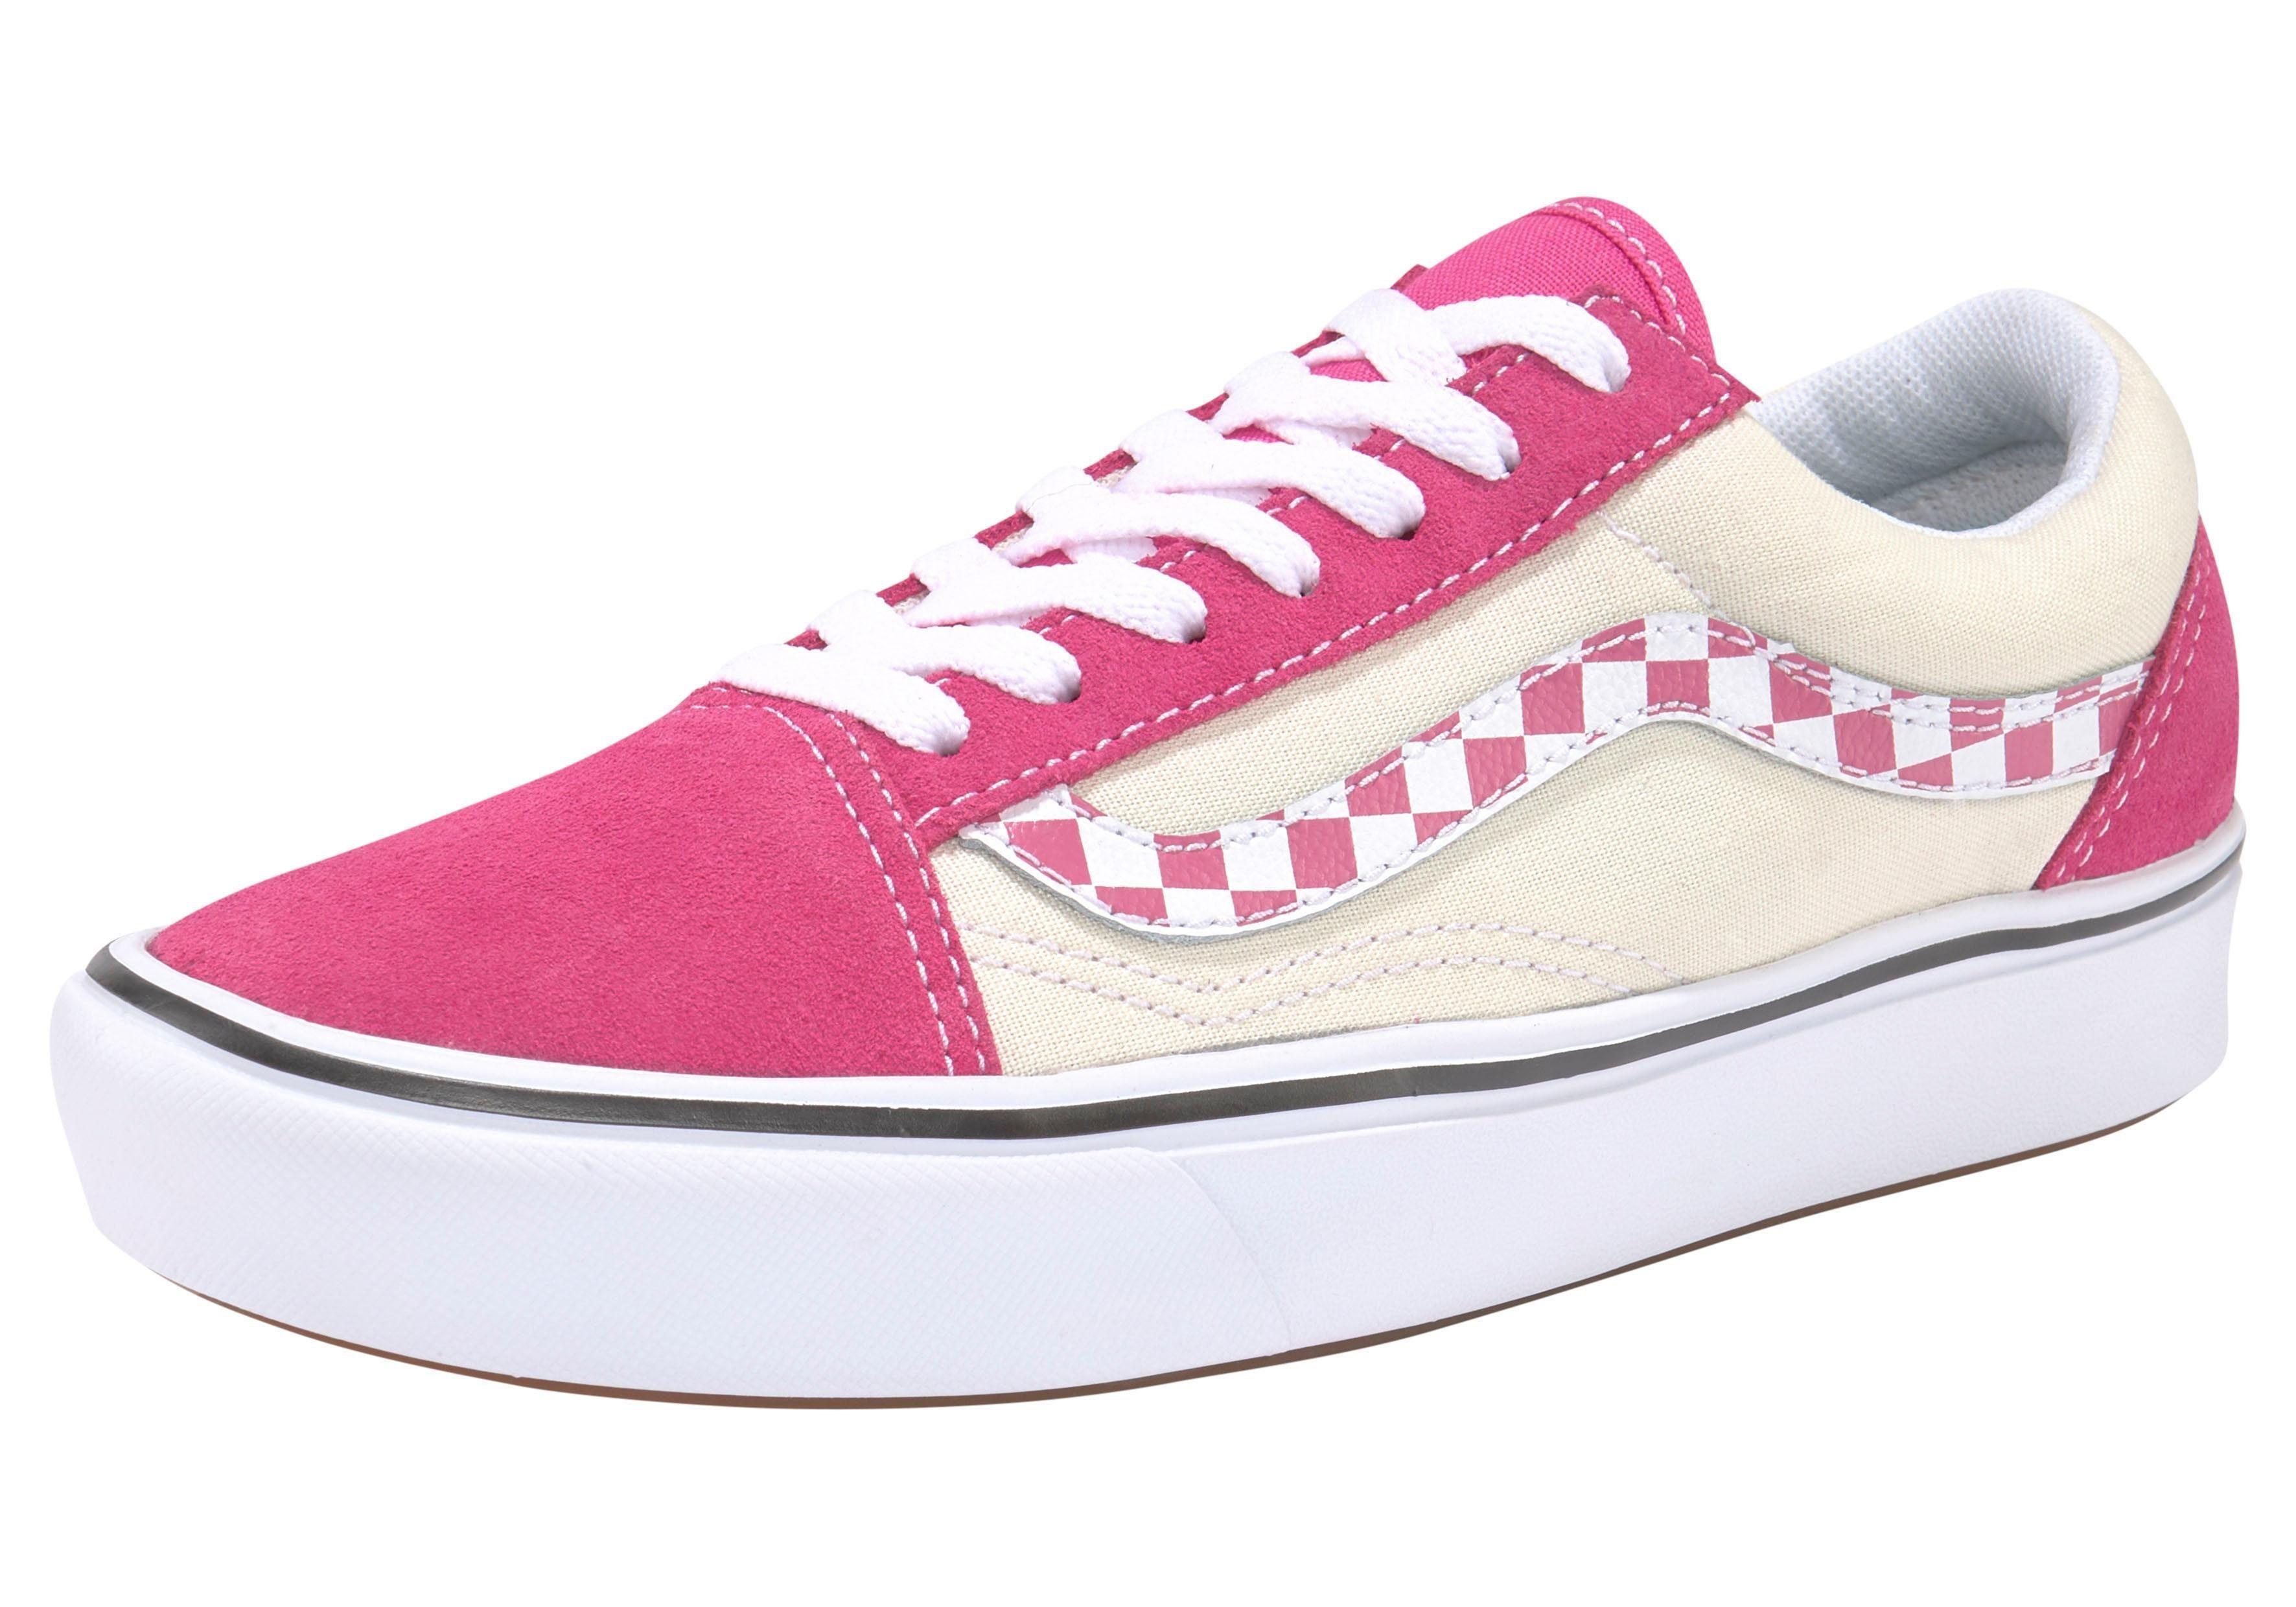 Vans Old Skool Schuhe Damen Pink (Satin Lux) | Schuhe damen